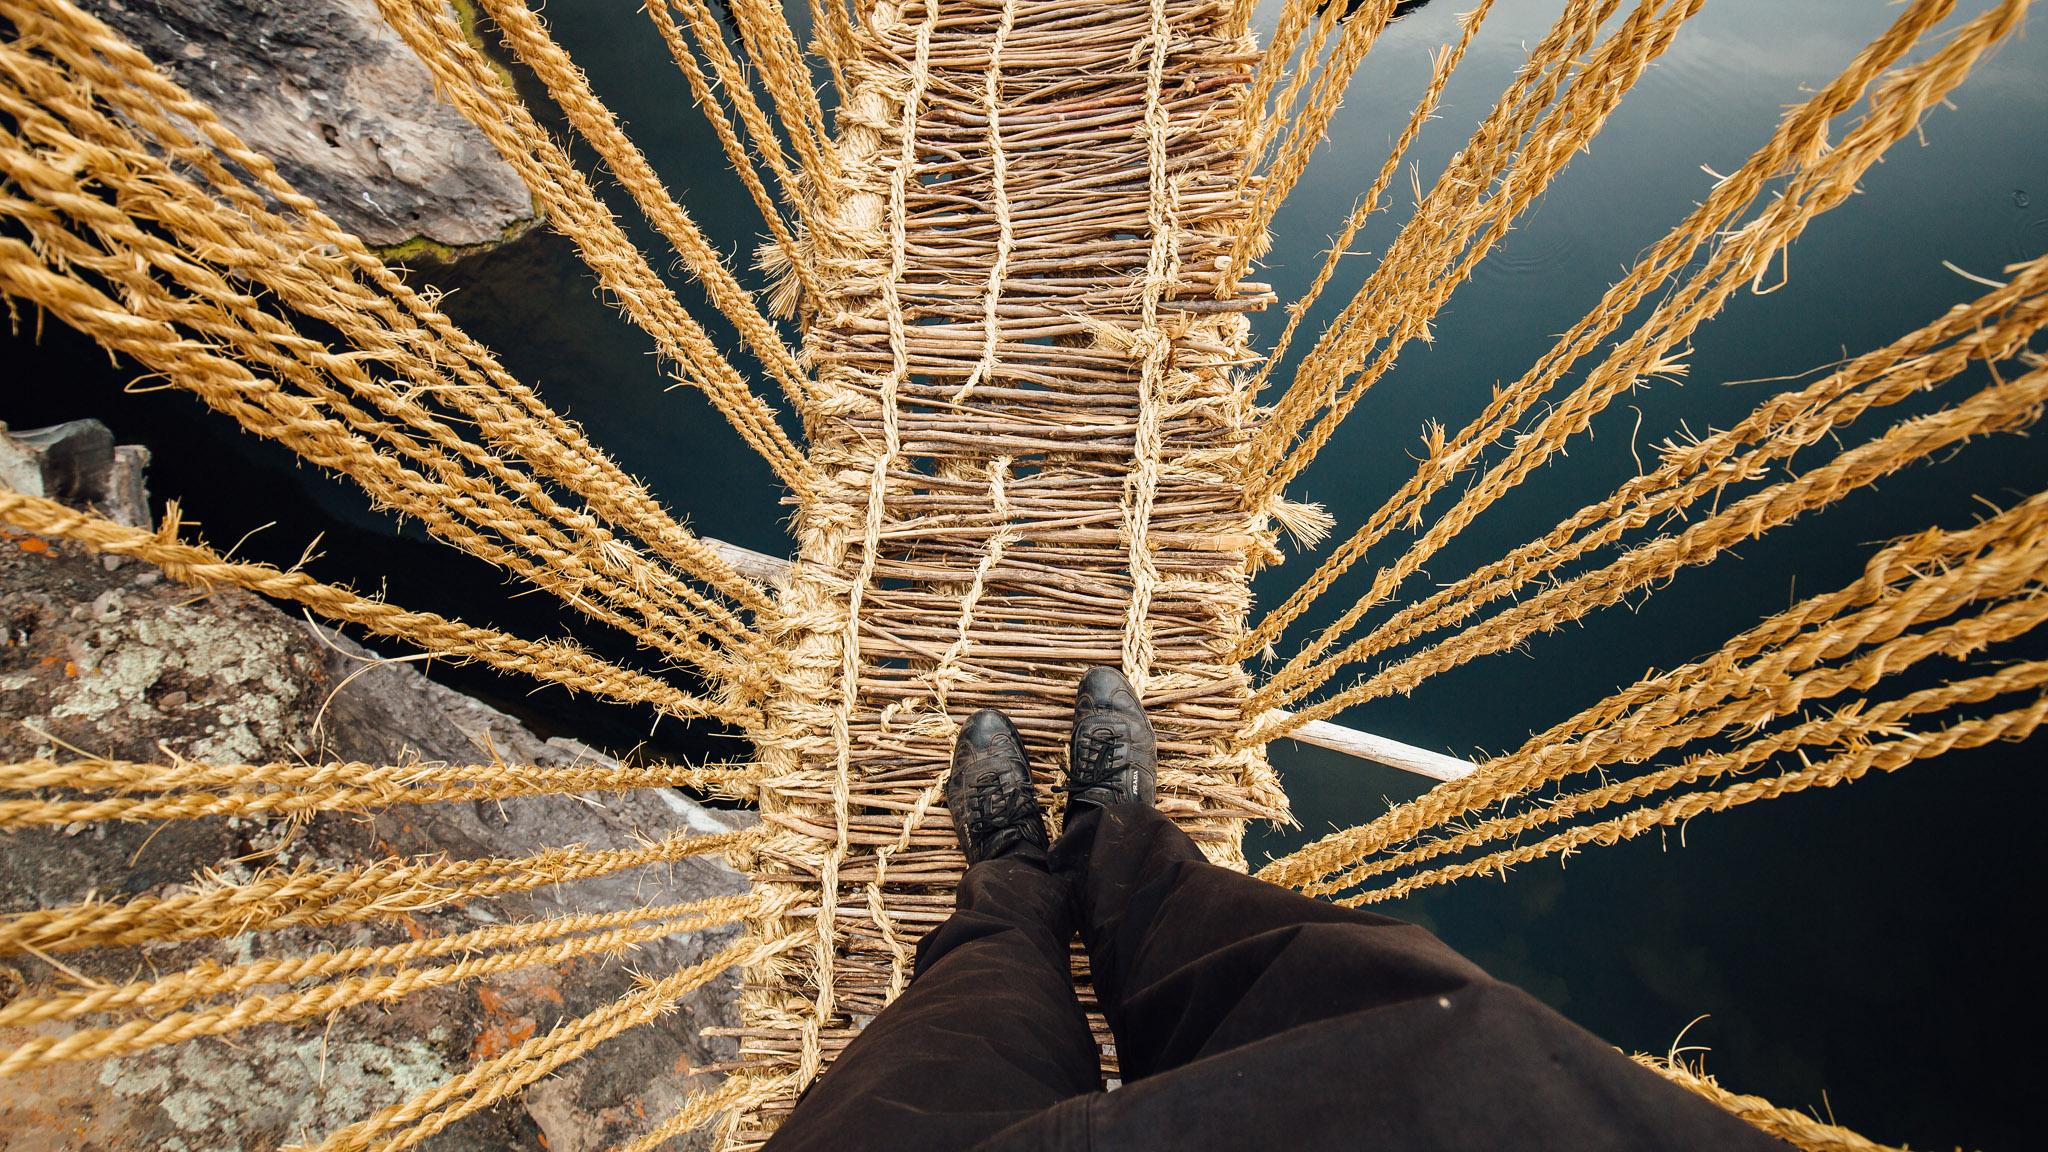 travel-photography-overlanding-apurimac-valley-peru-queswachaka-last-inca-bridge-6.jpg